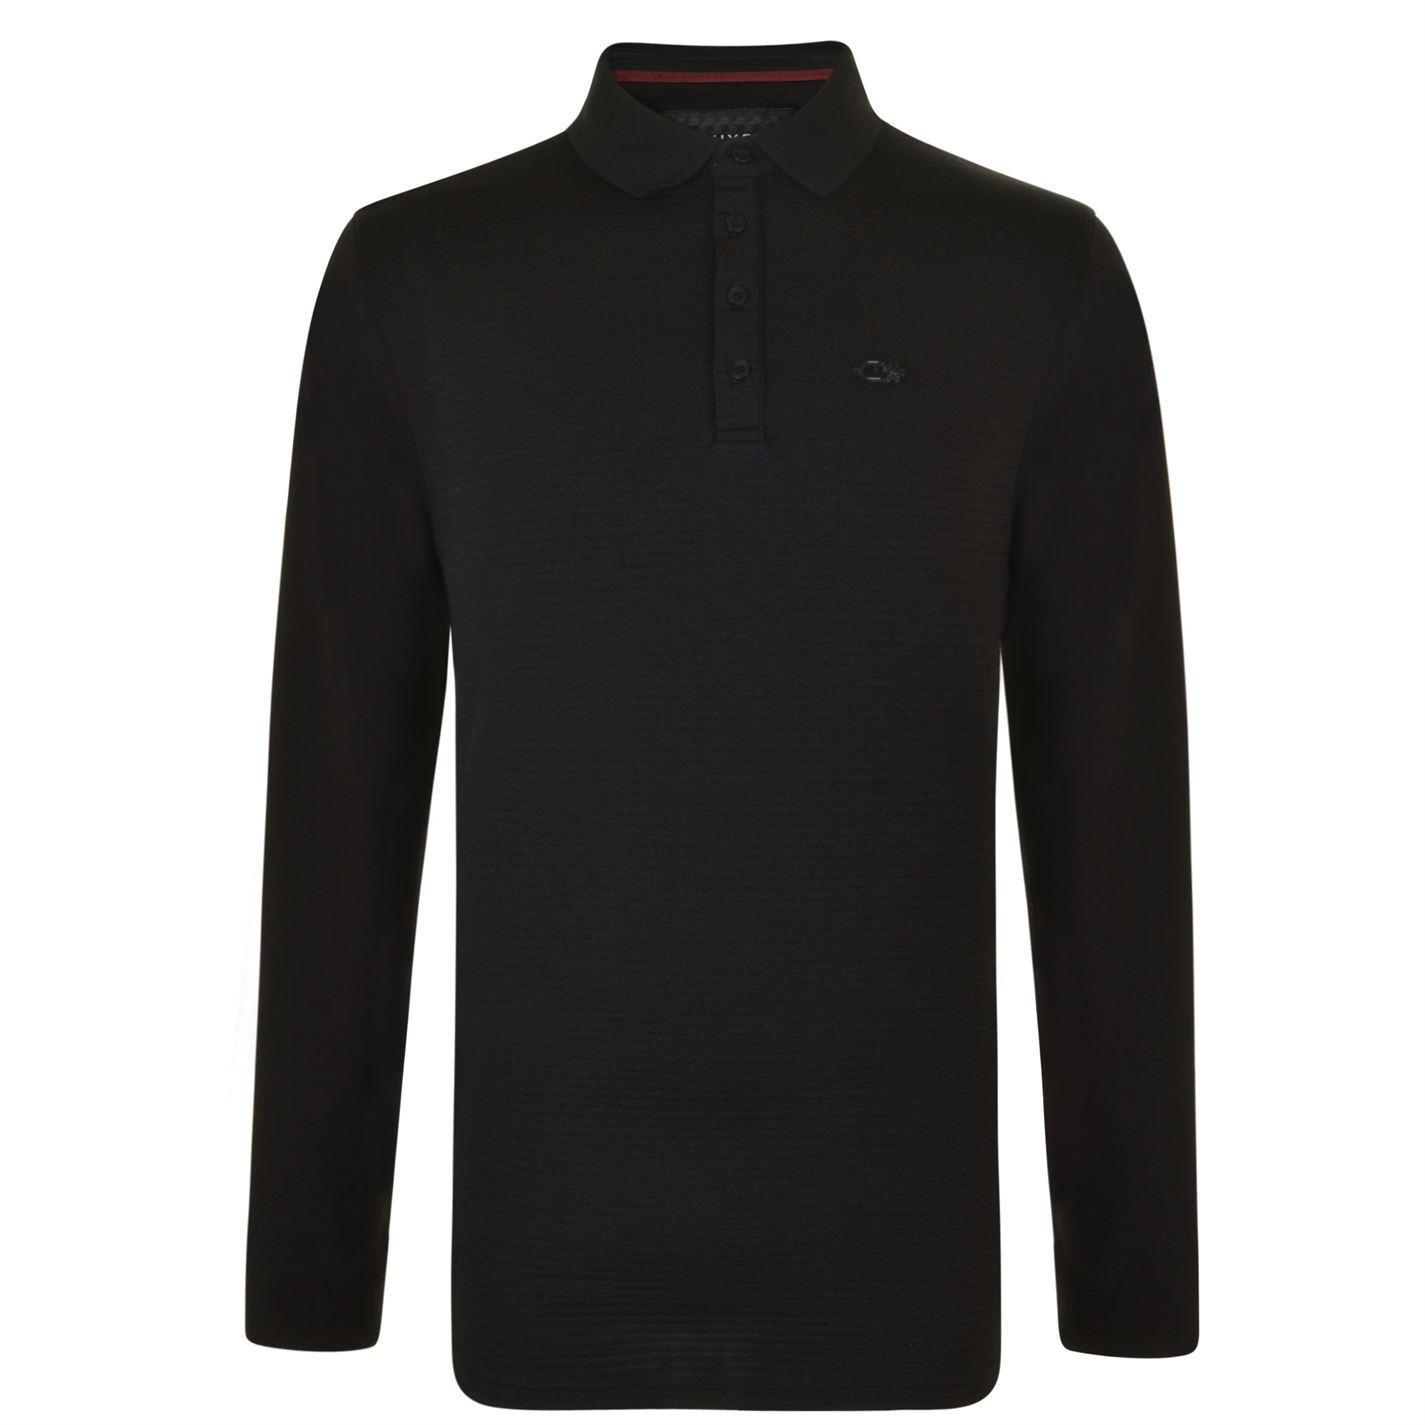 Cruyff Long Sleeved Polo Shirt UK XXL REF C1996+